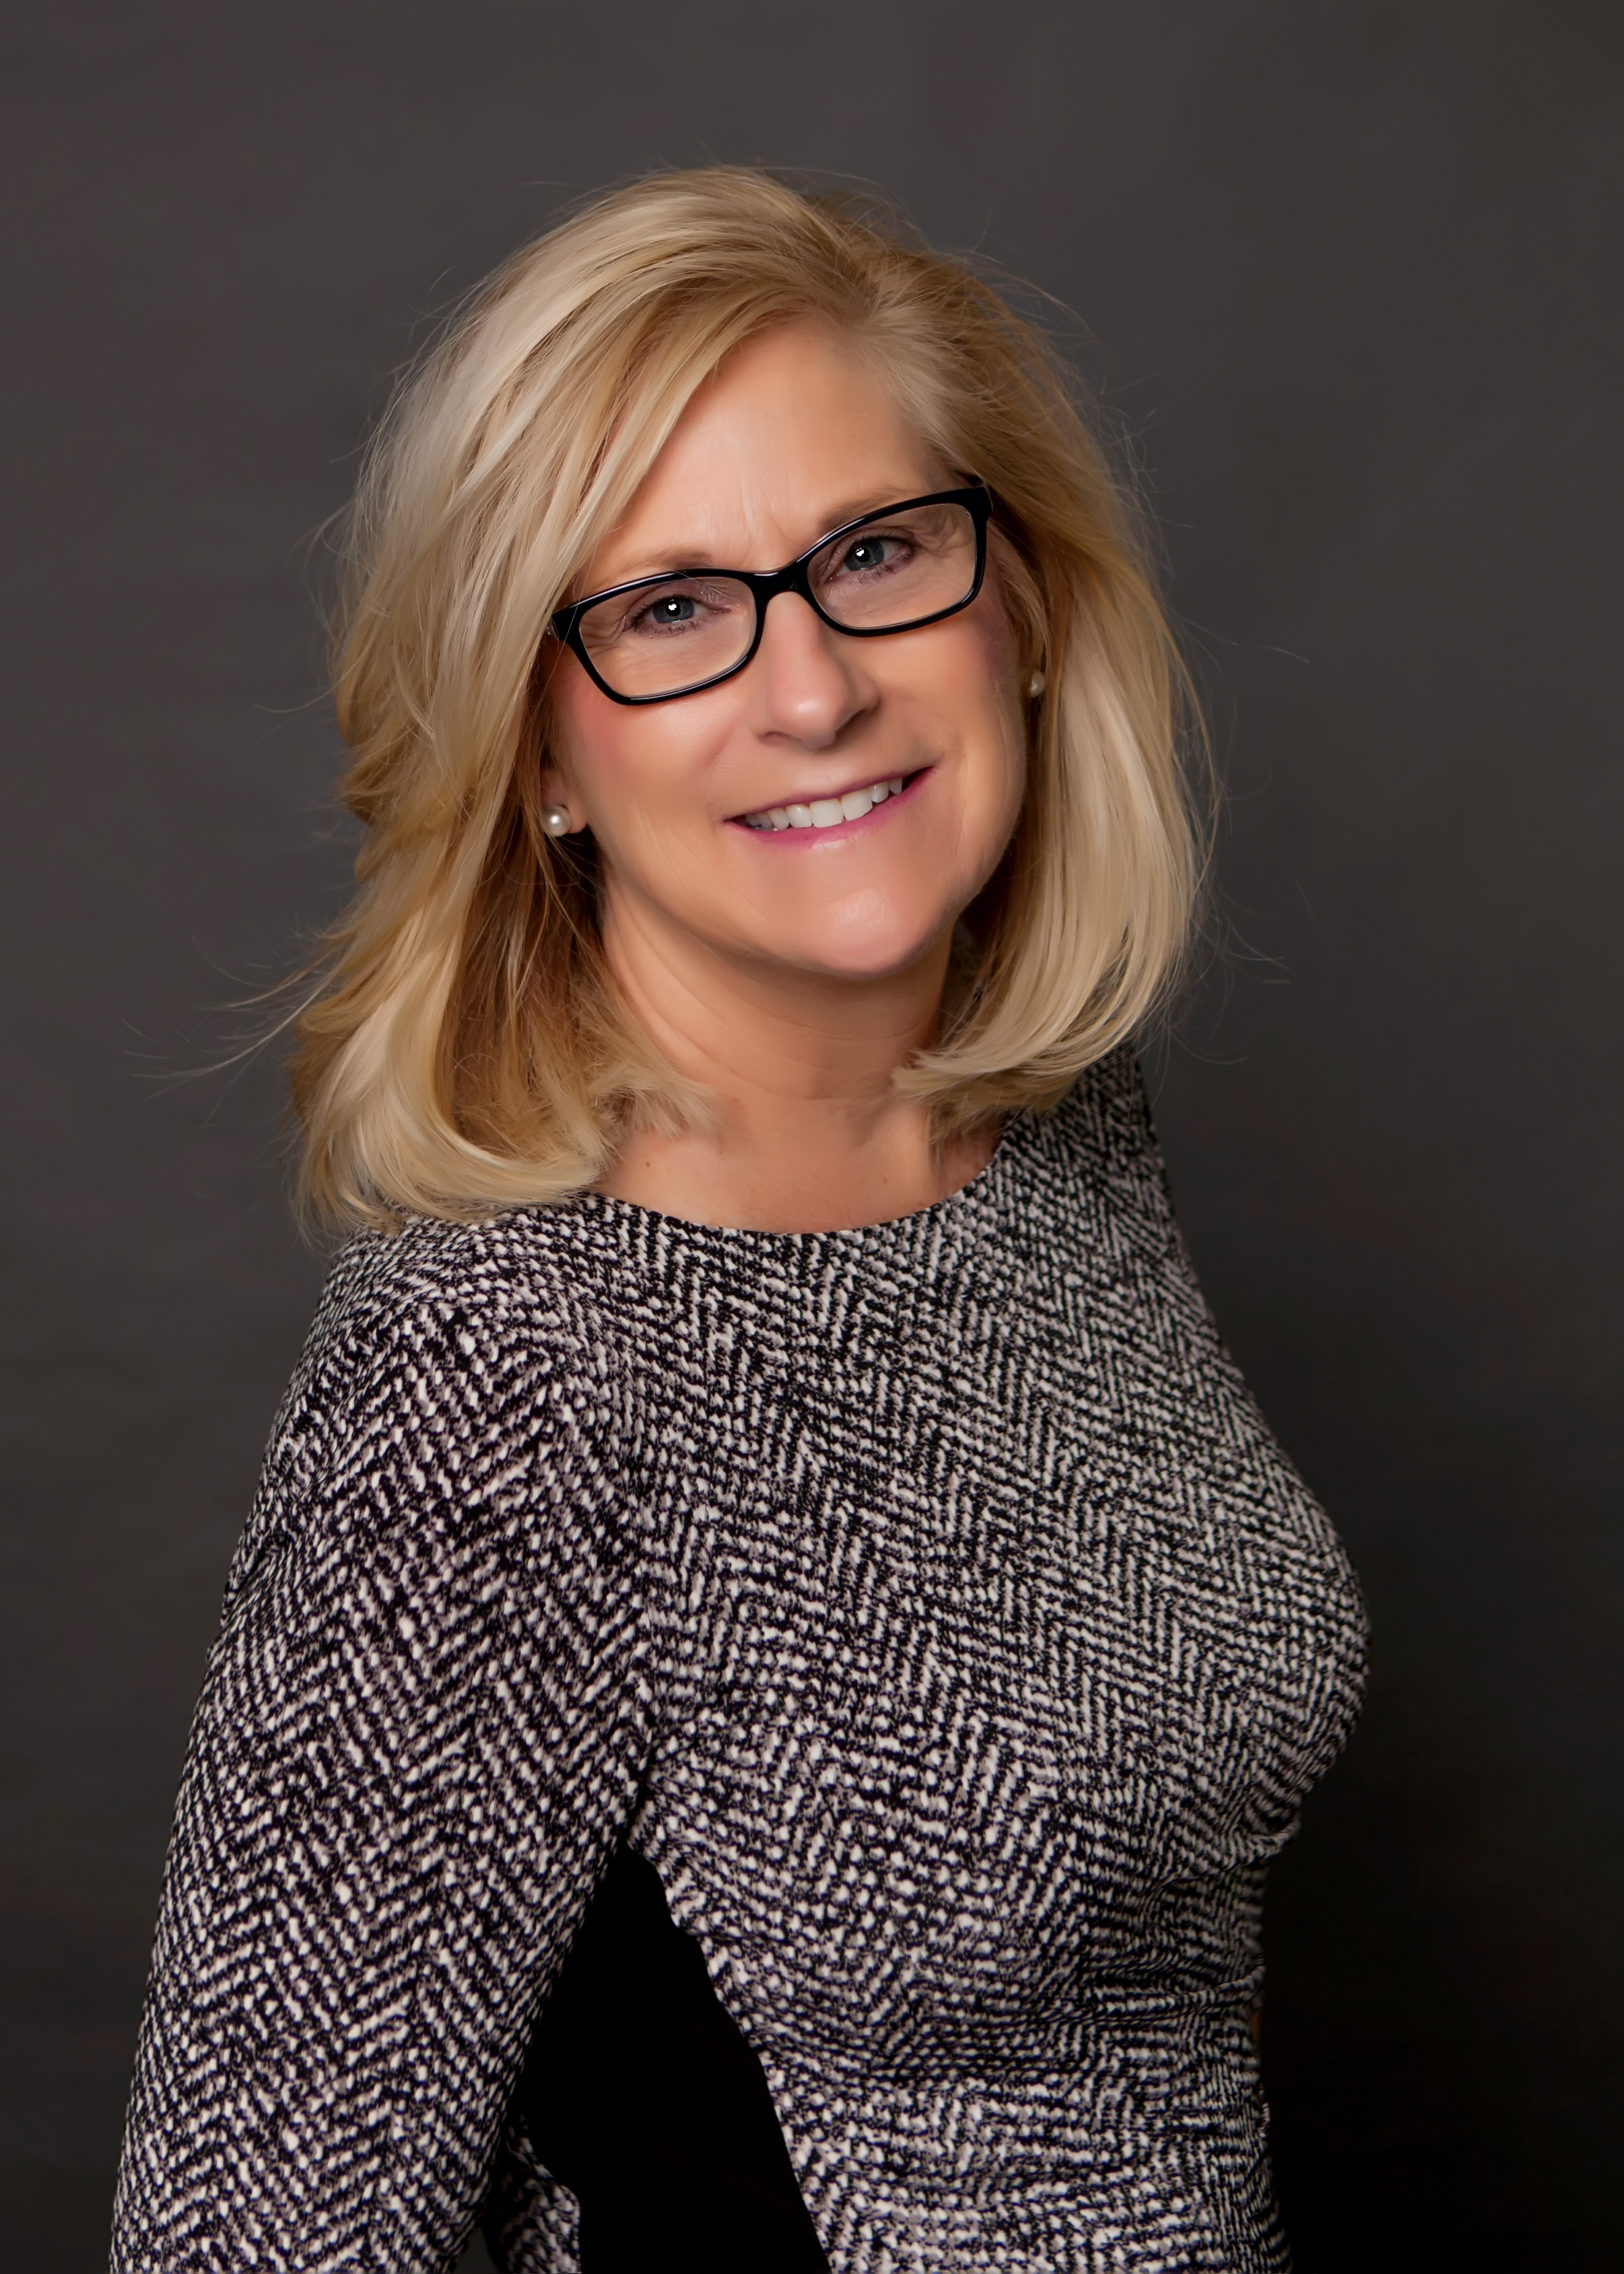 Sharon Schuessler, Secretary - sschuessler@capelawfirm.com